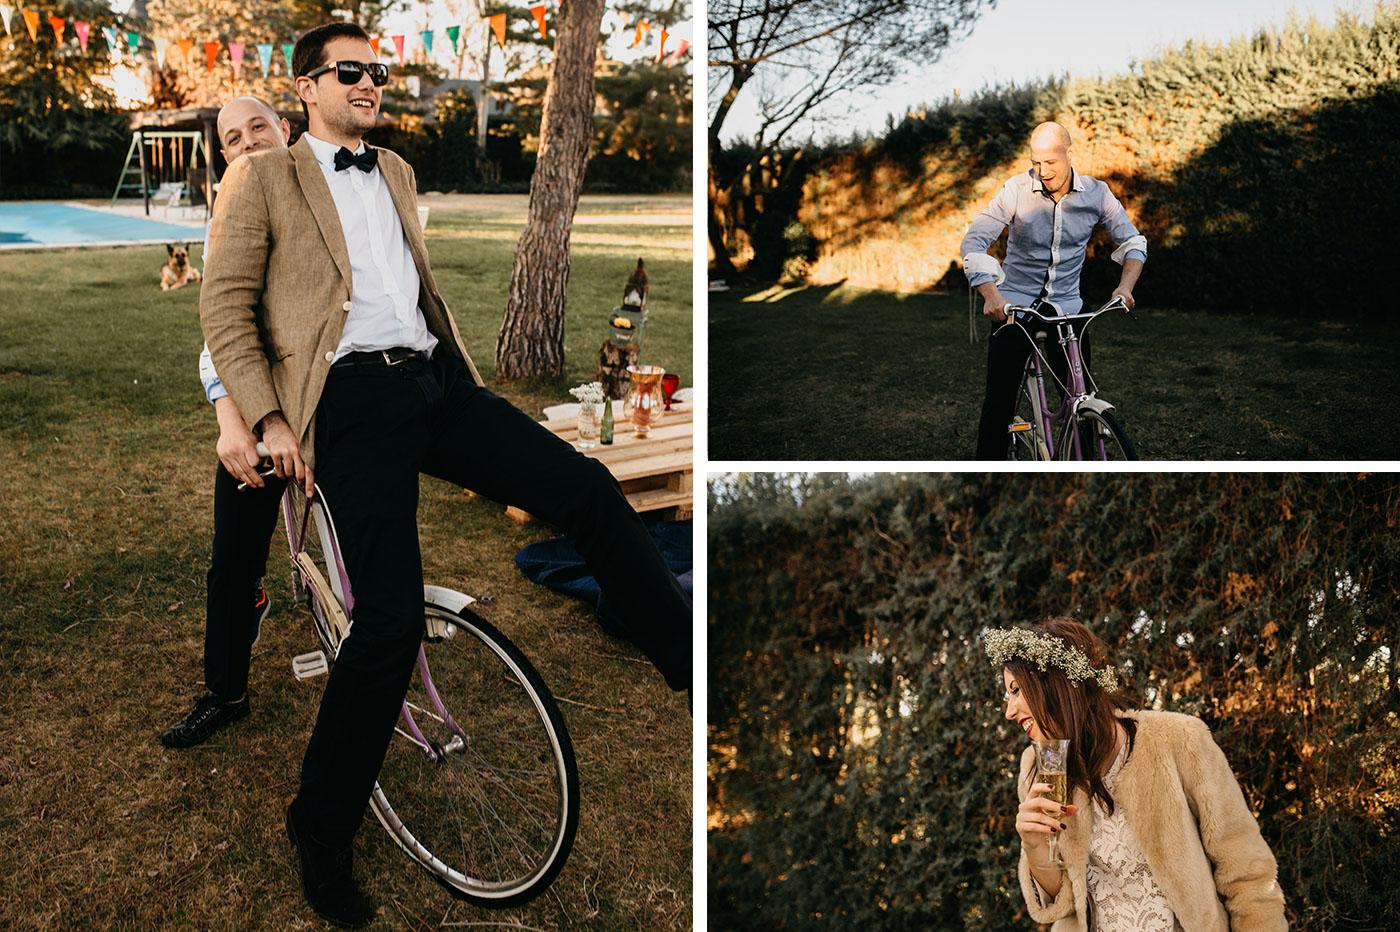 Velvet-Hush-fotografos-boda-al-aire-libre-madrid-079